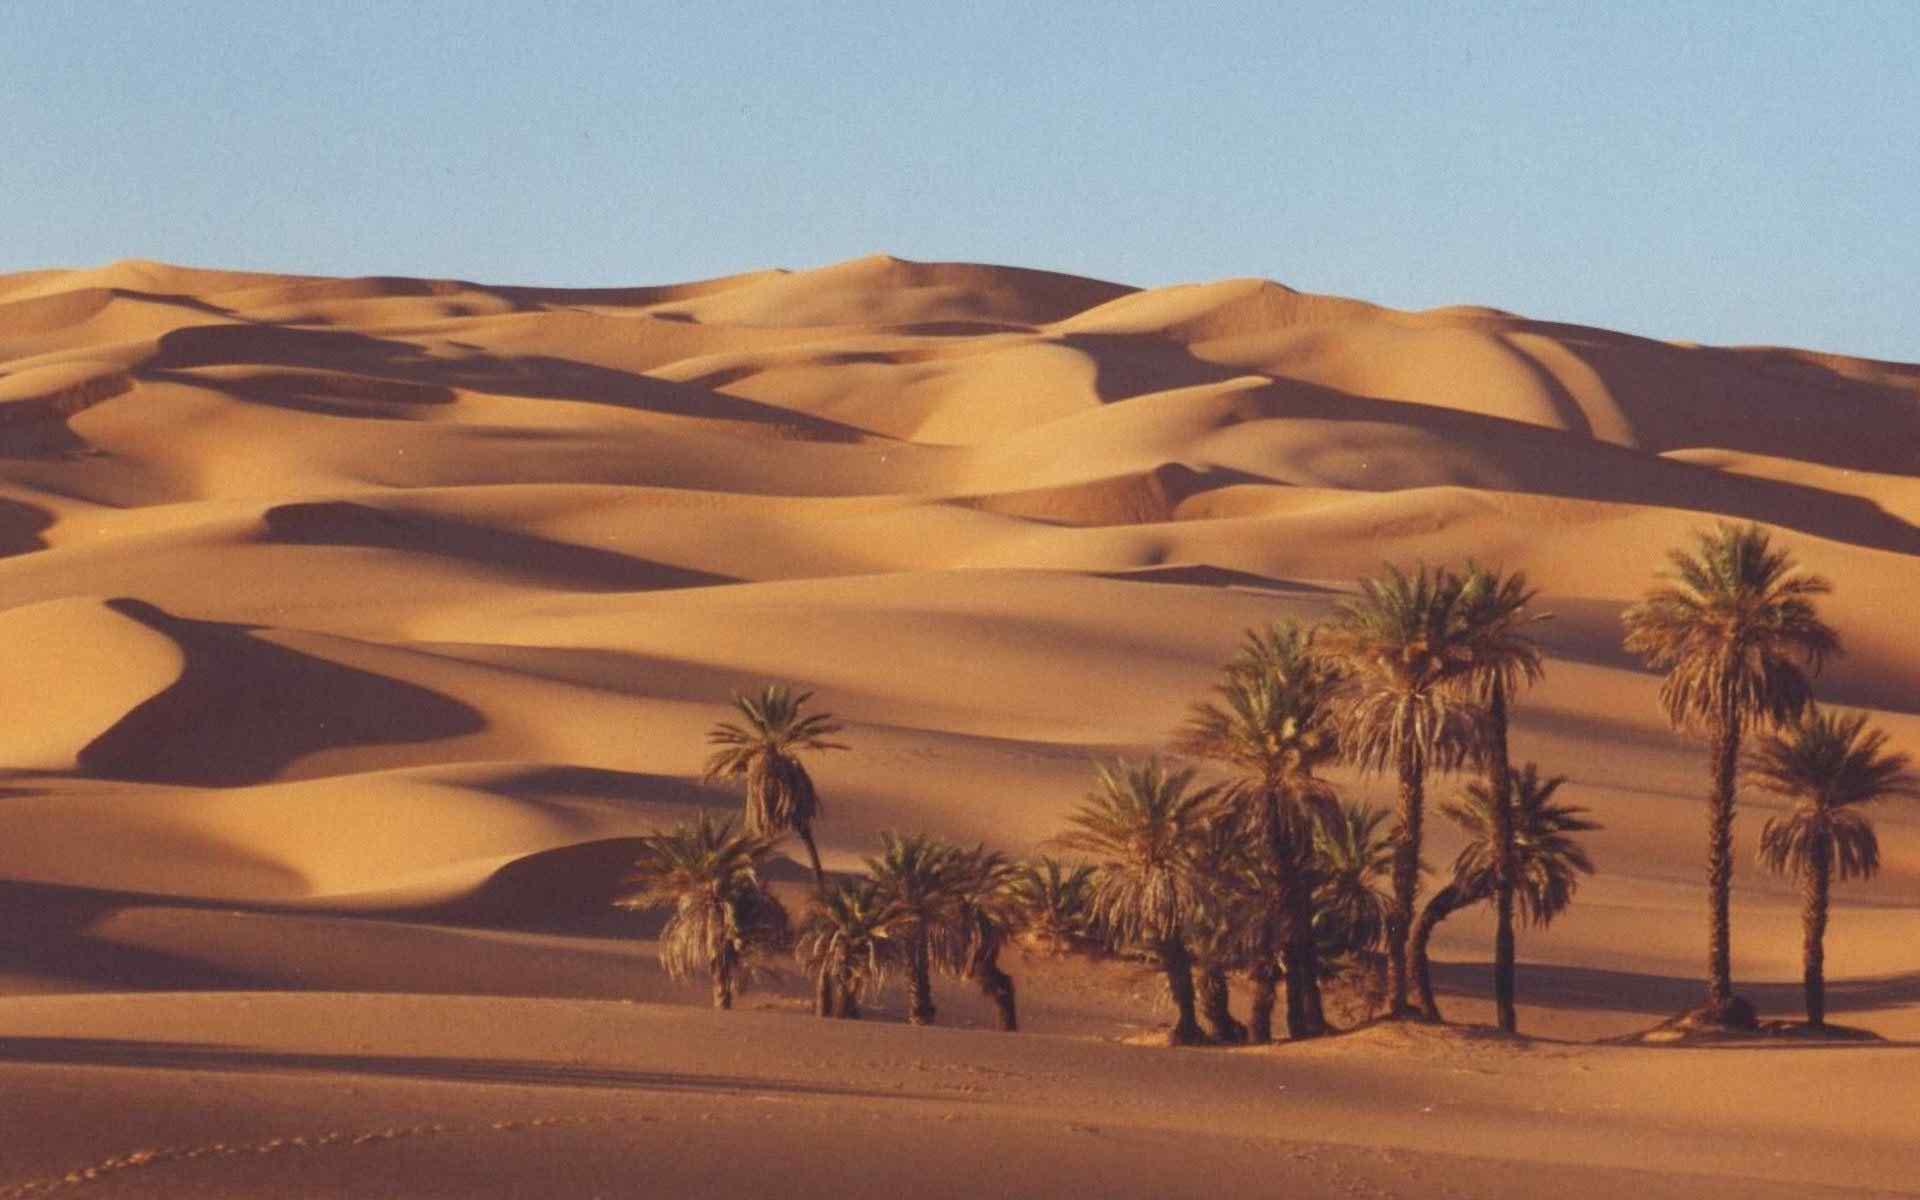 fonds sahara wallpaper image